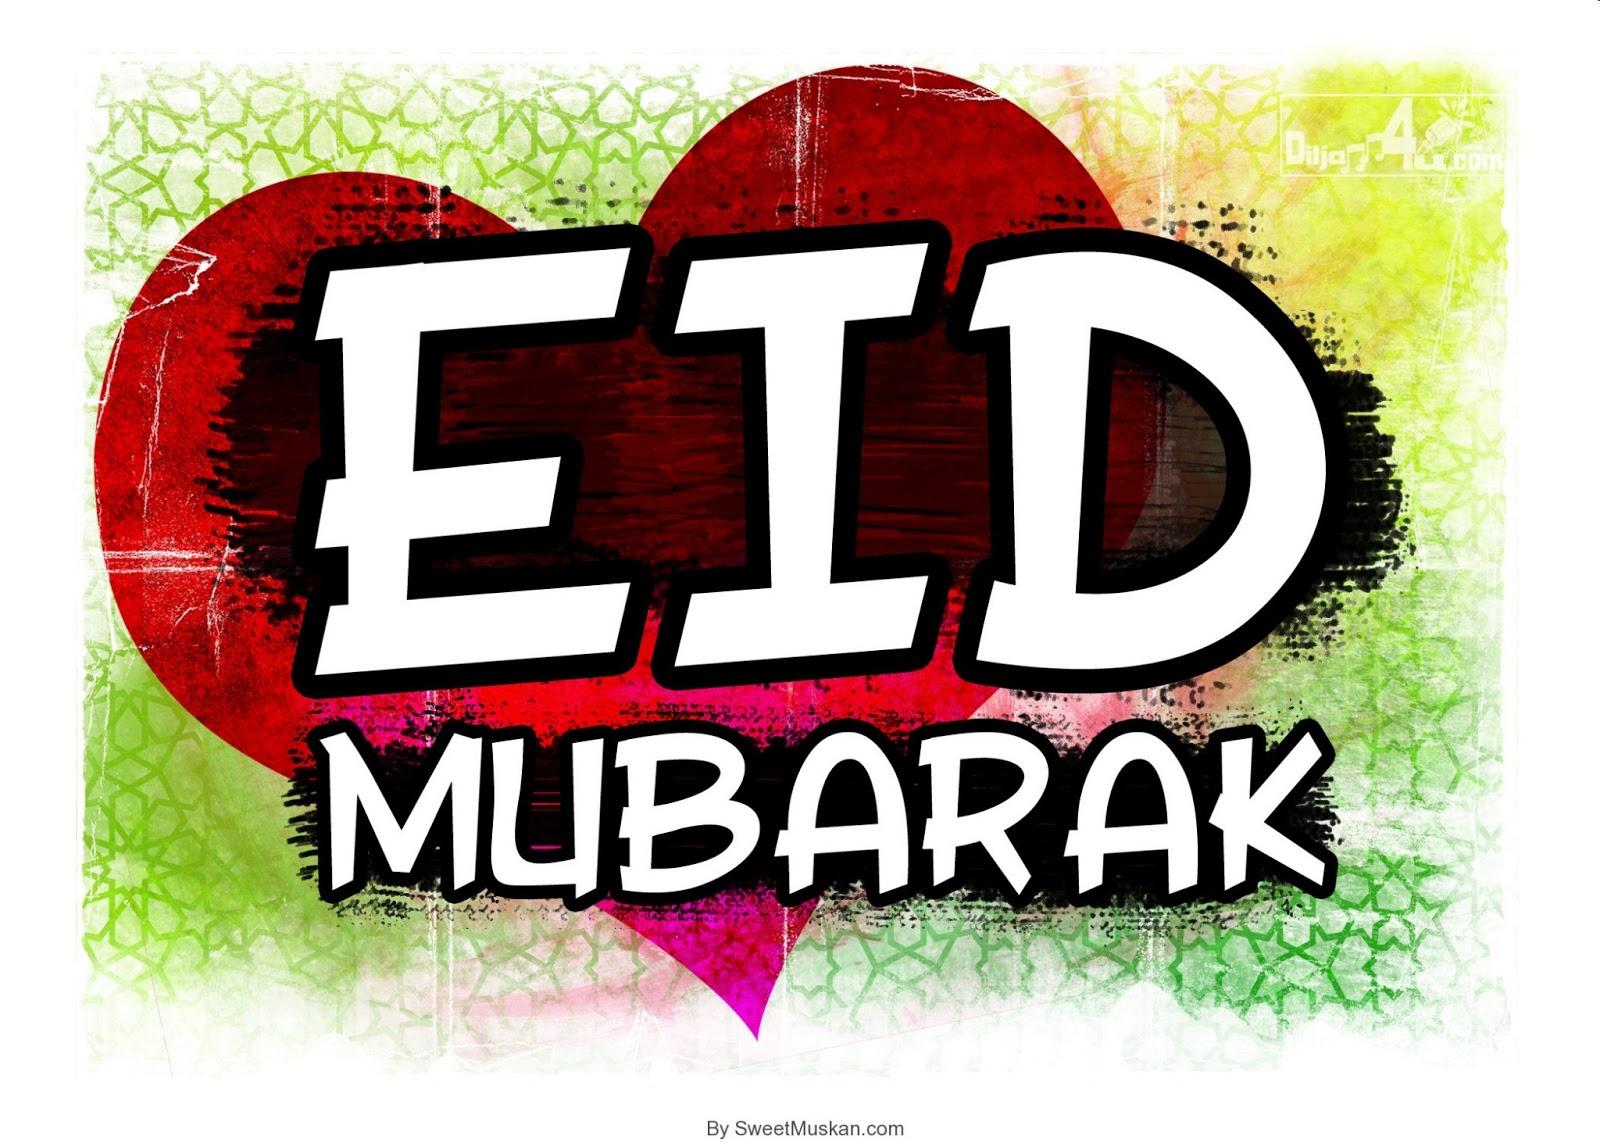 Best eid mubarak hd images greeting cards wallpaper and photos eid mubarak hd images greeting cards wallpaper and photos kristyandbryce Choice Image